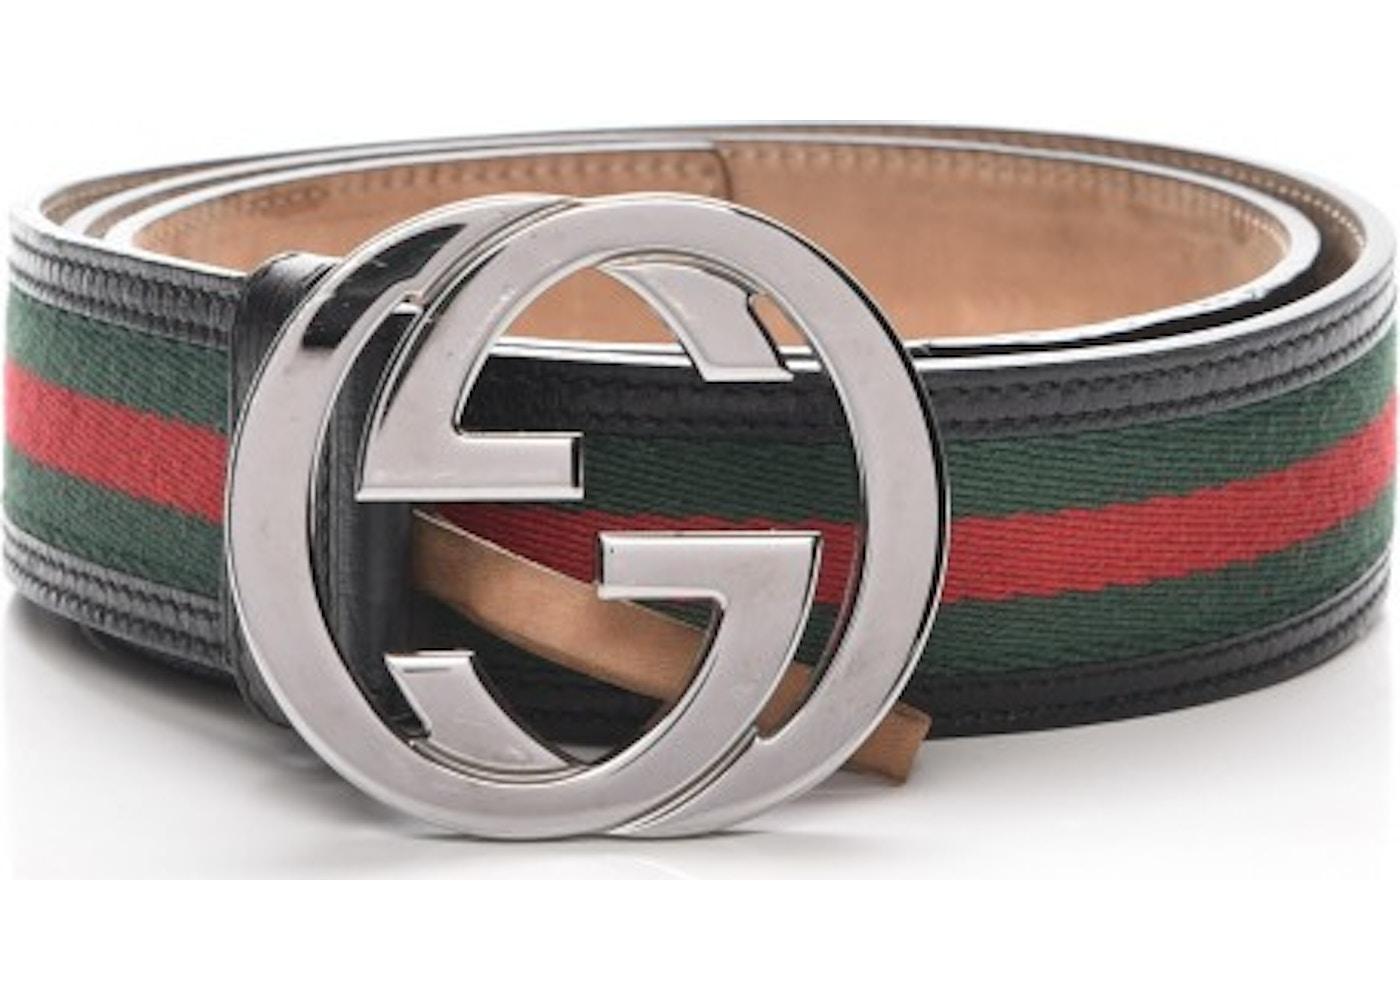 b6e6940bb905 Gucci Interlocking G Belt Monogram Web 100 40 Black/Green/Red. Monogram Web  100 40 Black/Green/Red